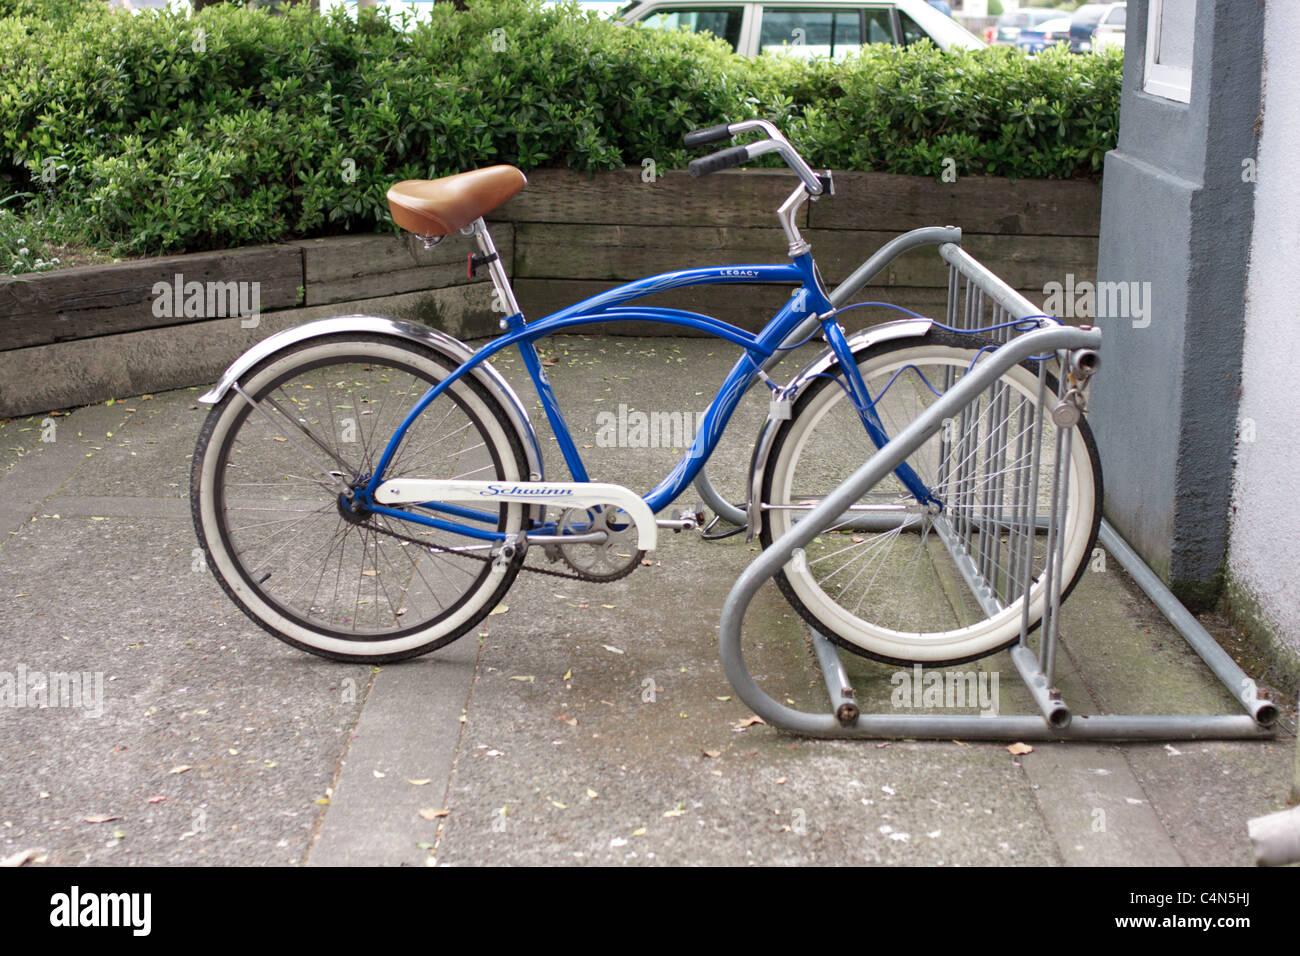 Blaue Schwinn Fahrrad Stockfoto, Bild: 37344766 - Alamy